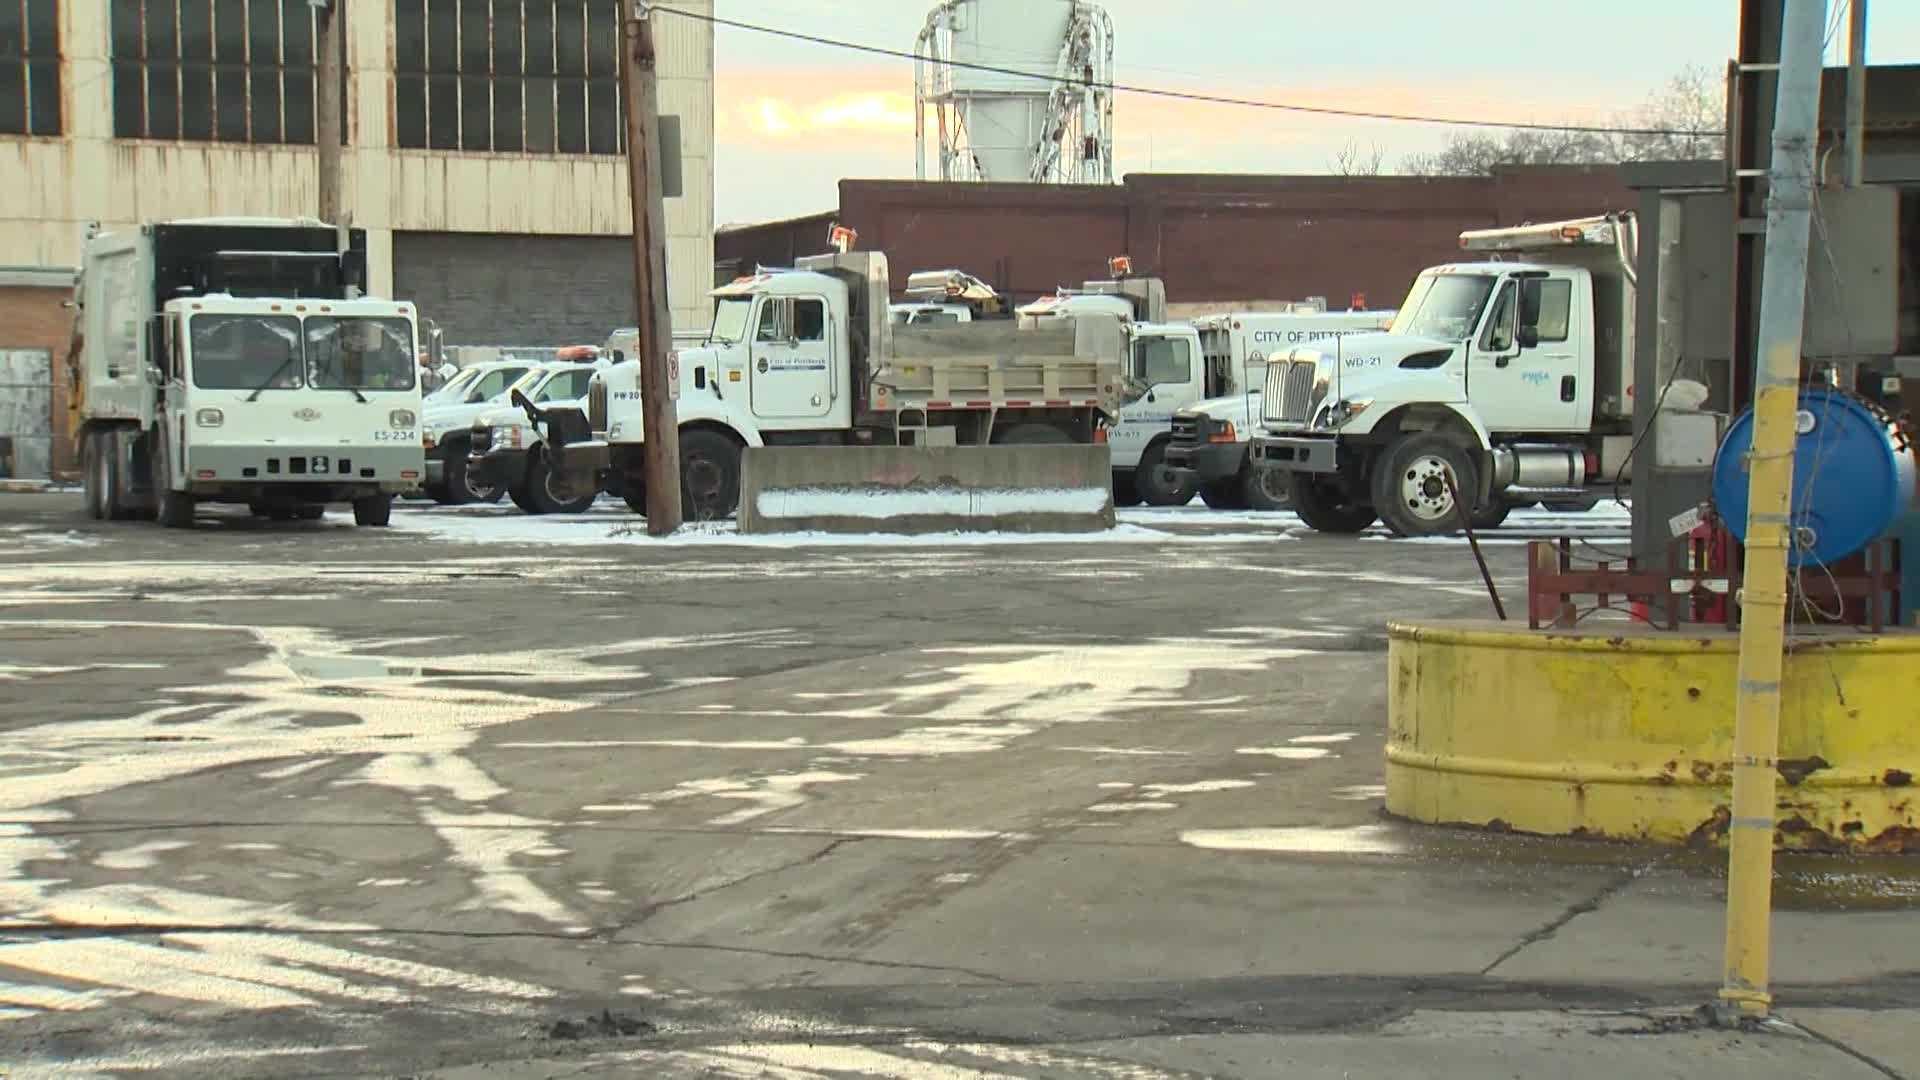 city of Pittsburgh snow trucks